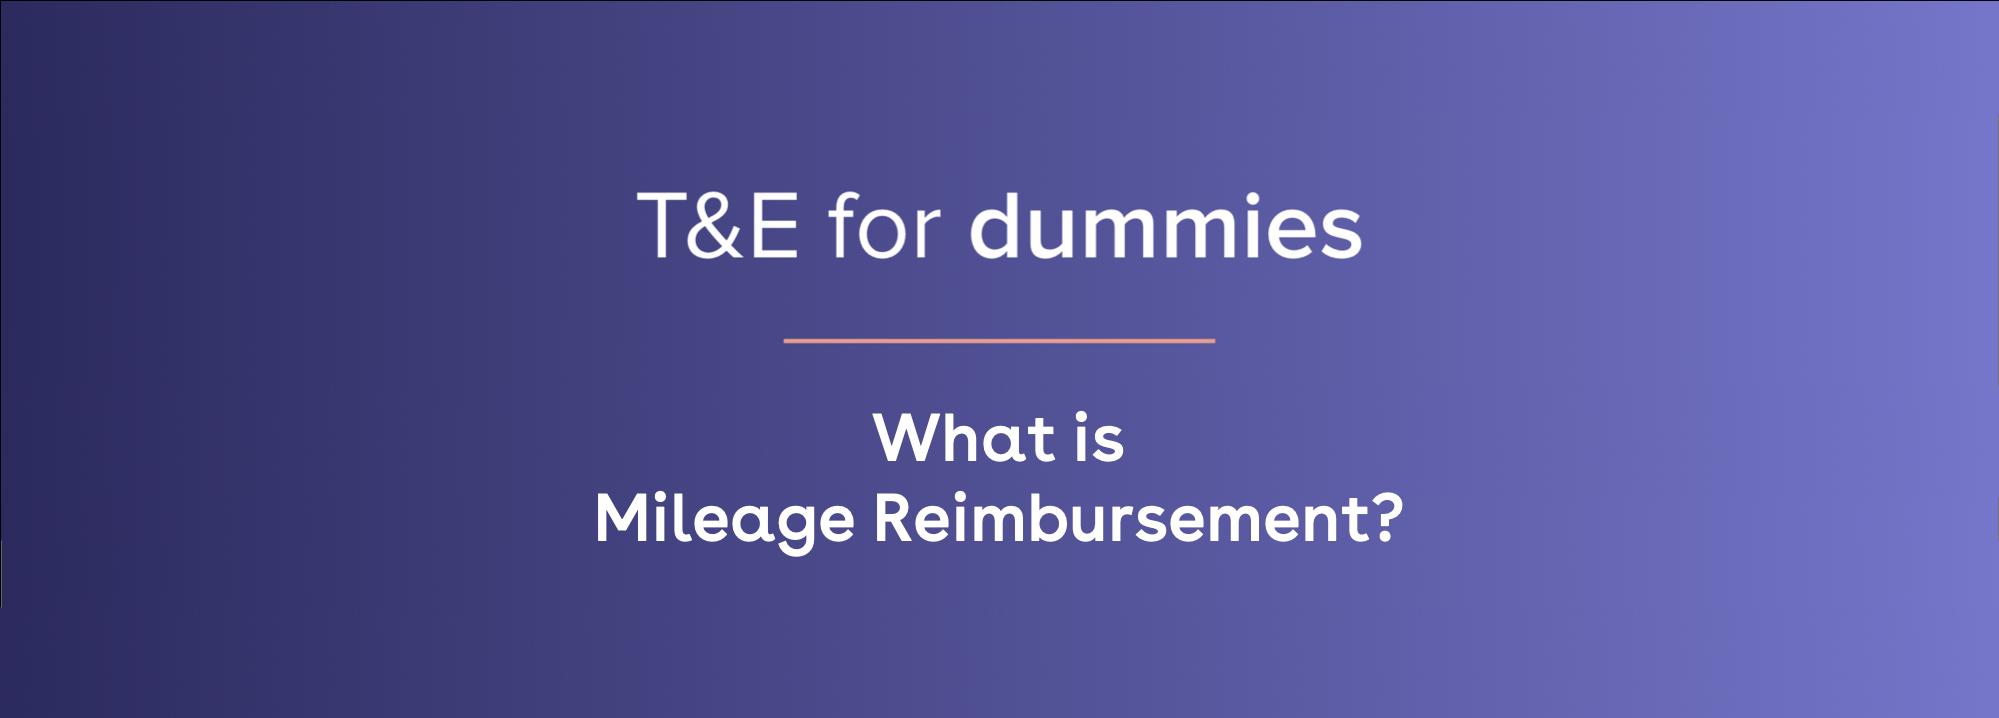 what is mileage reimbursement